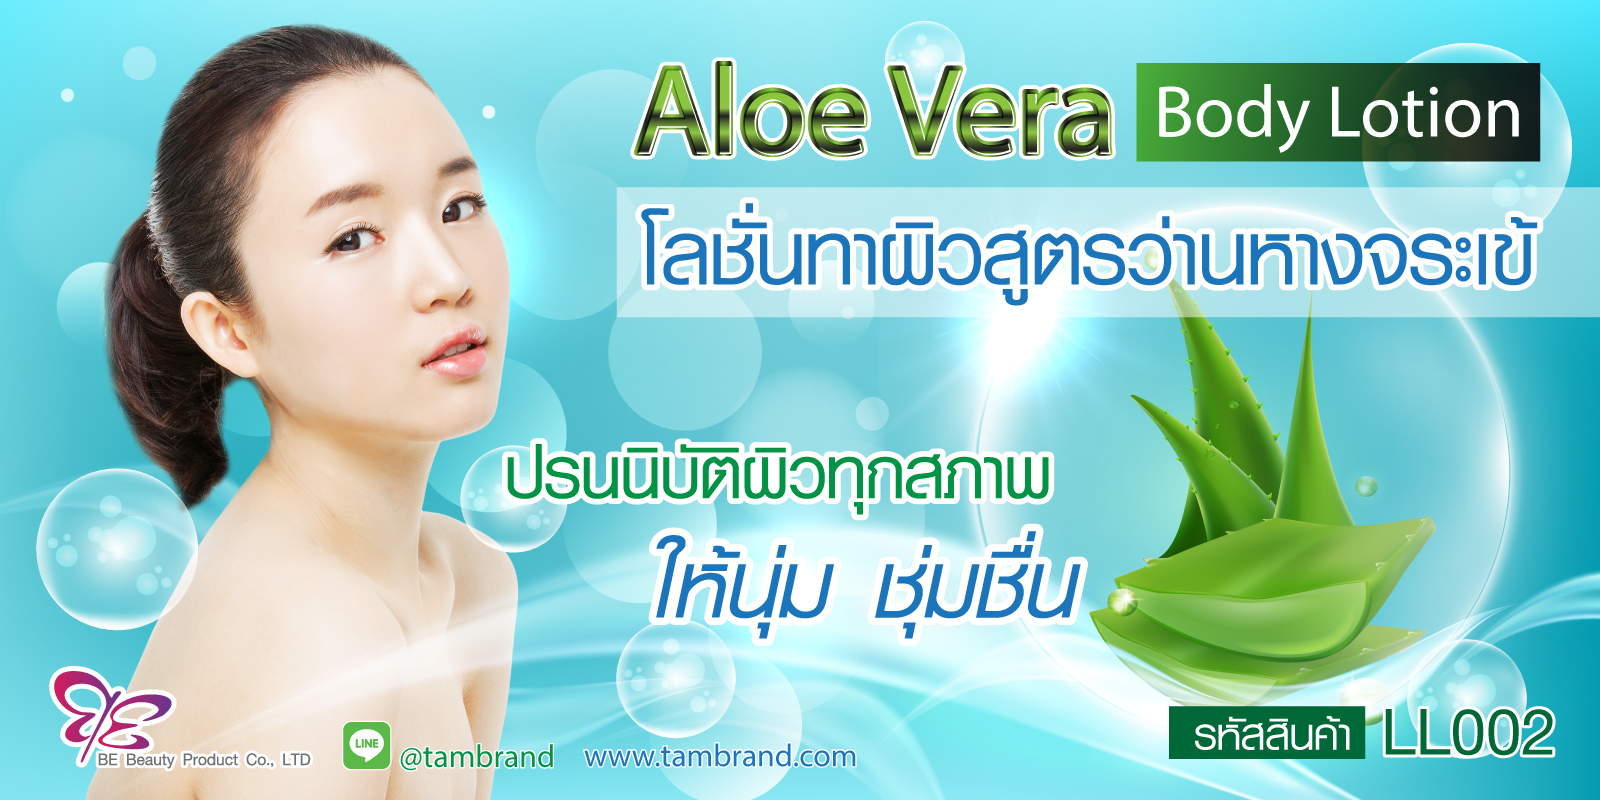 Aloe Vera Body Lotion โลชั่นว่านหางจรเข้ : สำหรับทำแบรนด์และแบ่งบรรจุ